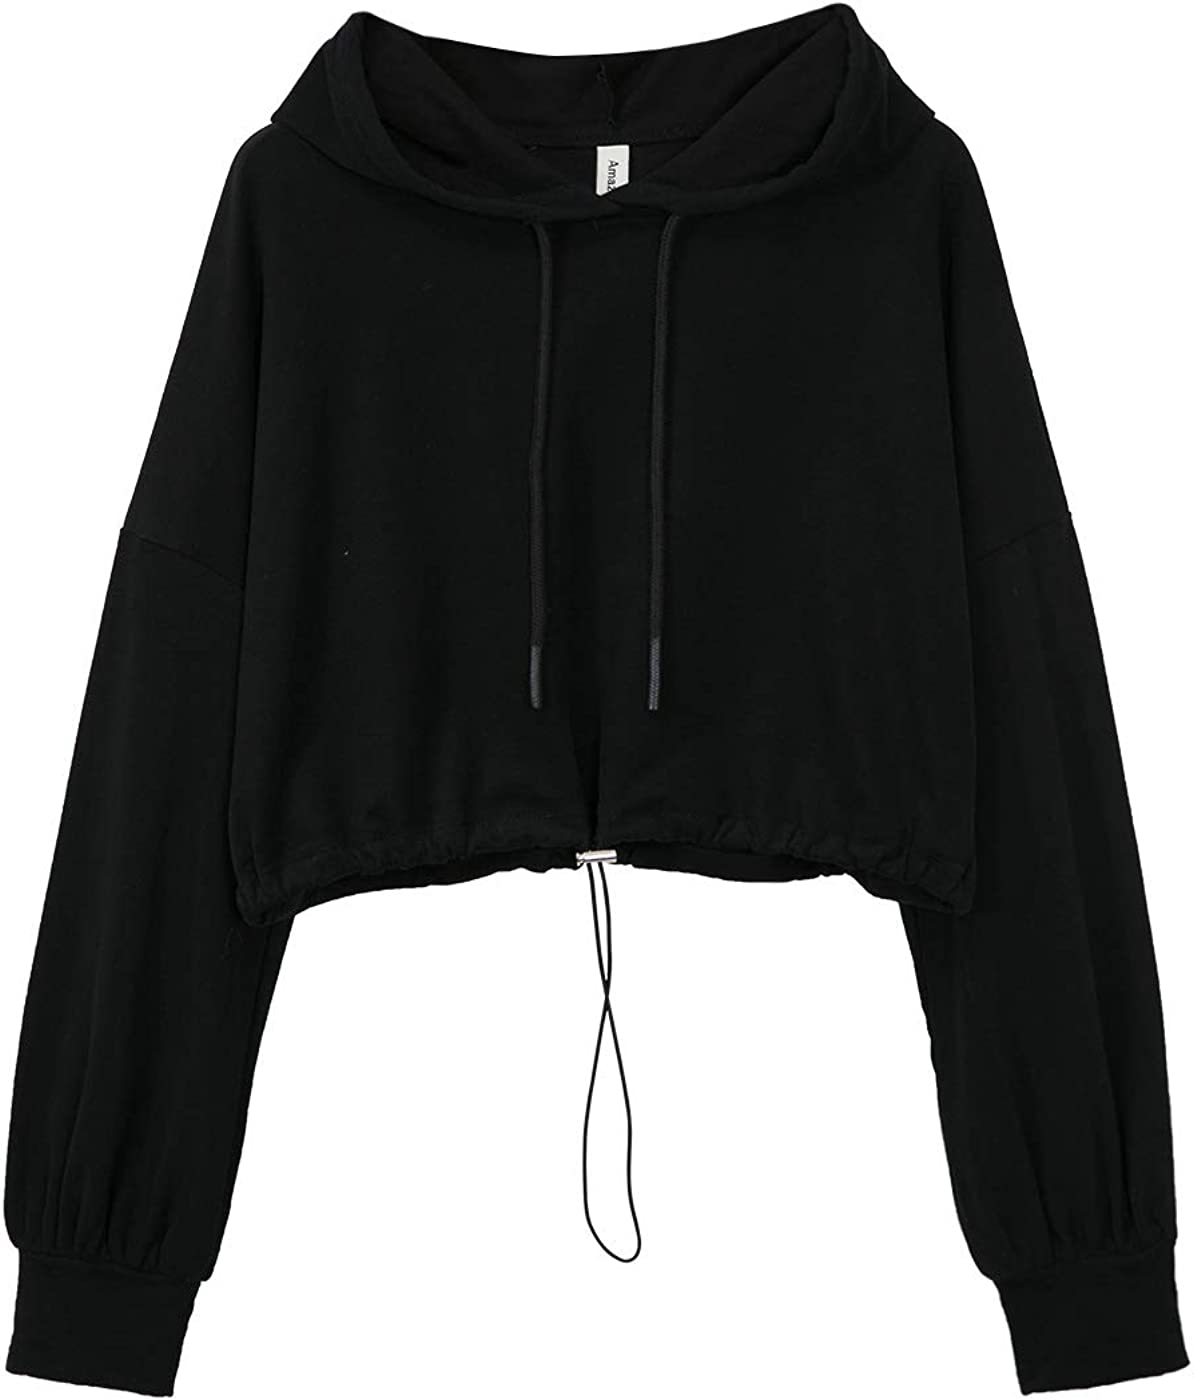 Amazhiyu Women's Cropped Hoodies Long Sleeve Drawstring Pullover Hooded Sweatshirt Casual Loose Crop Top